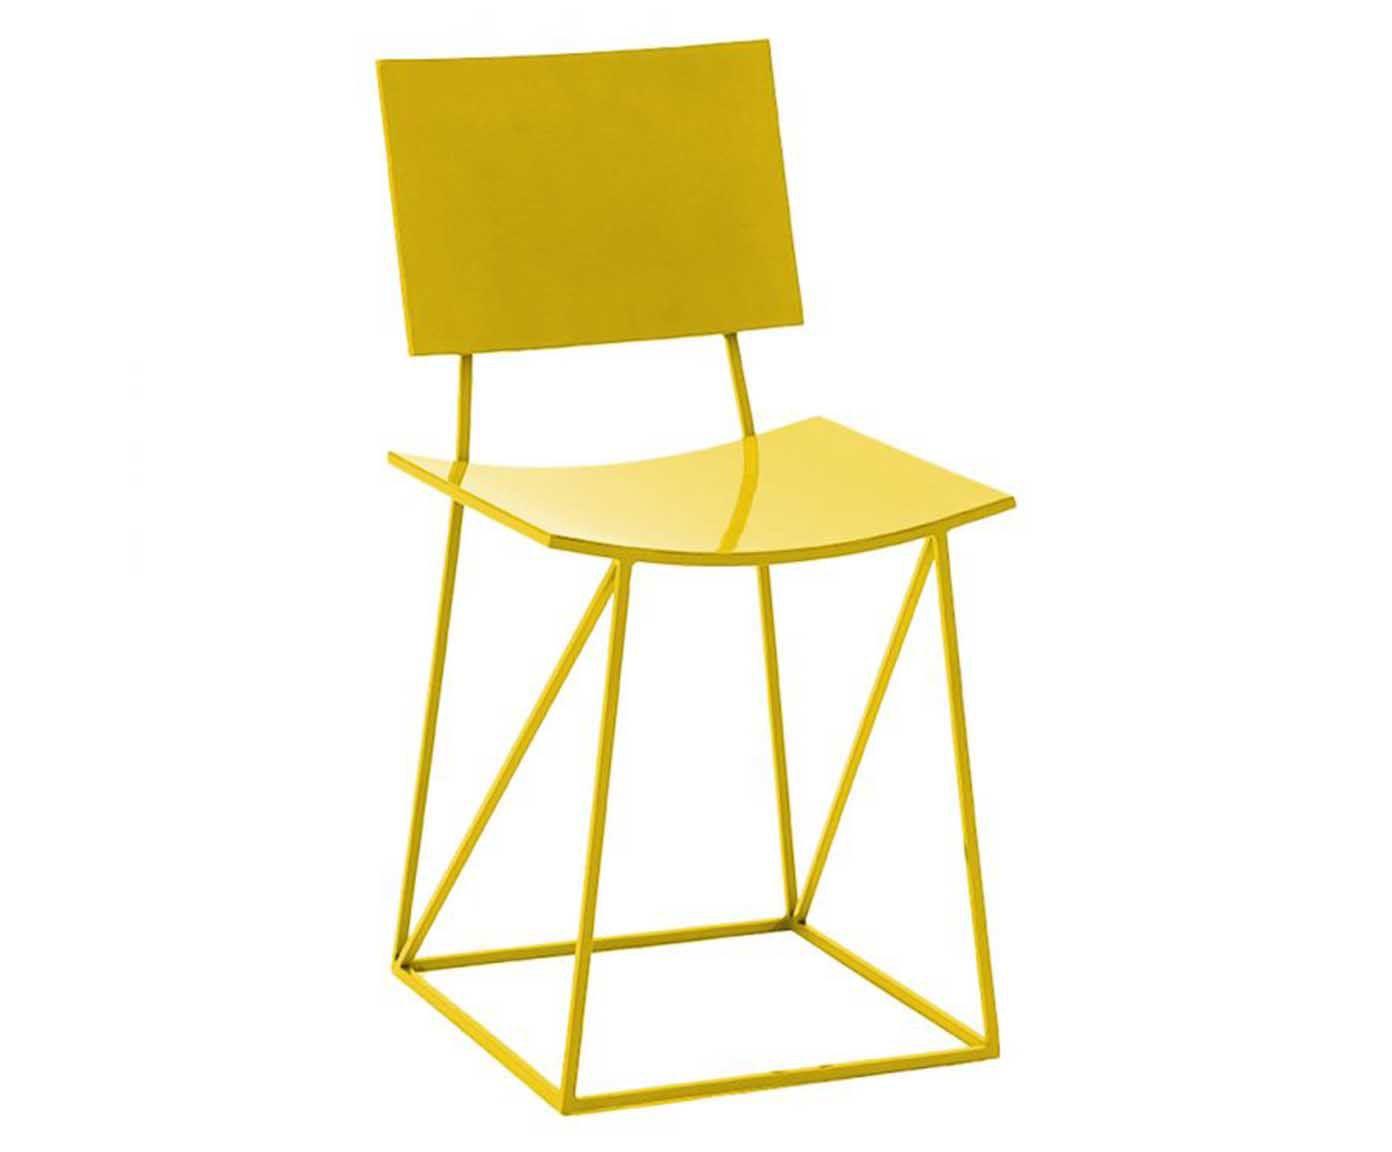 Cadeira charm - soleil   Westwing.com.br